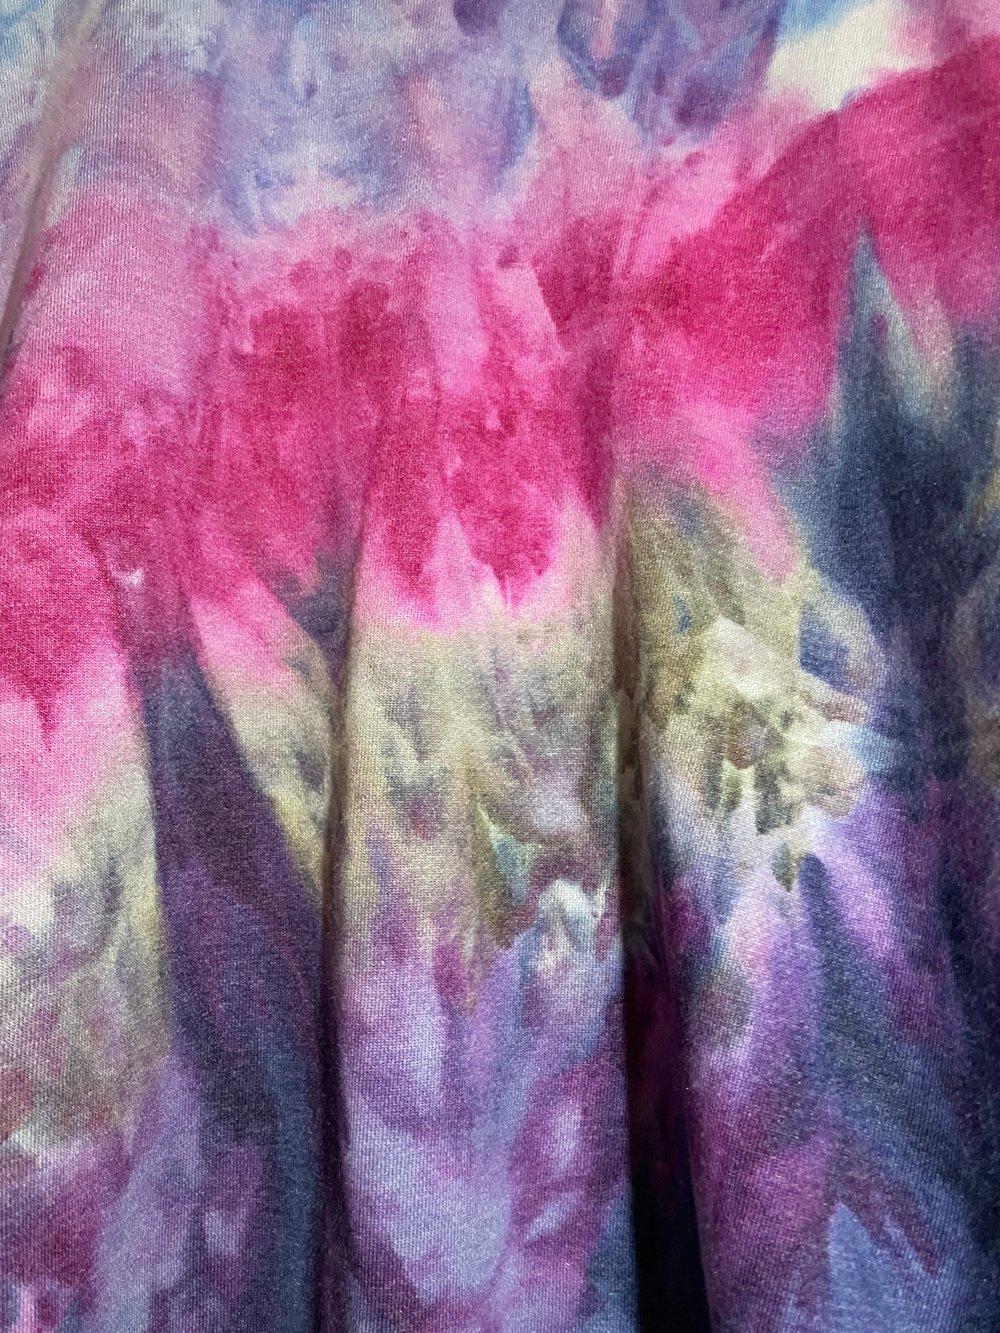 Tie-Dye Sweatshirt #4 - Medium